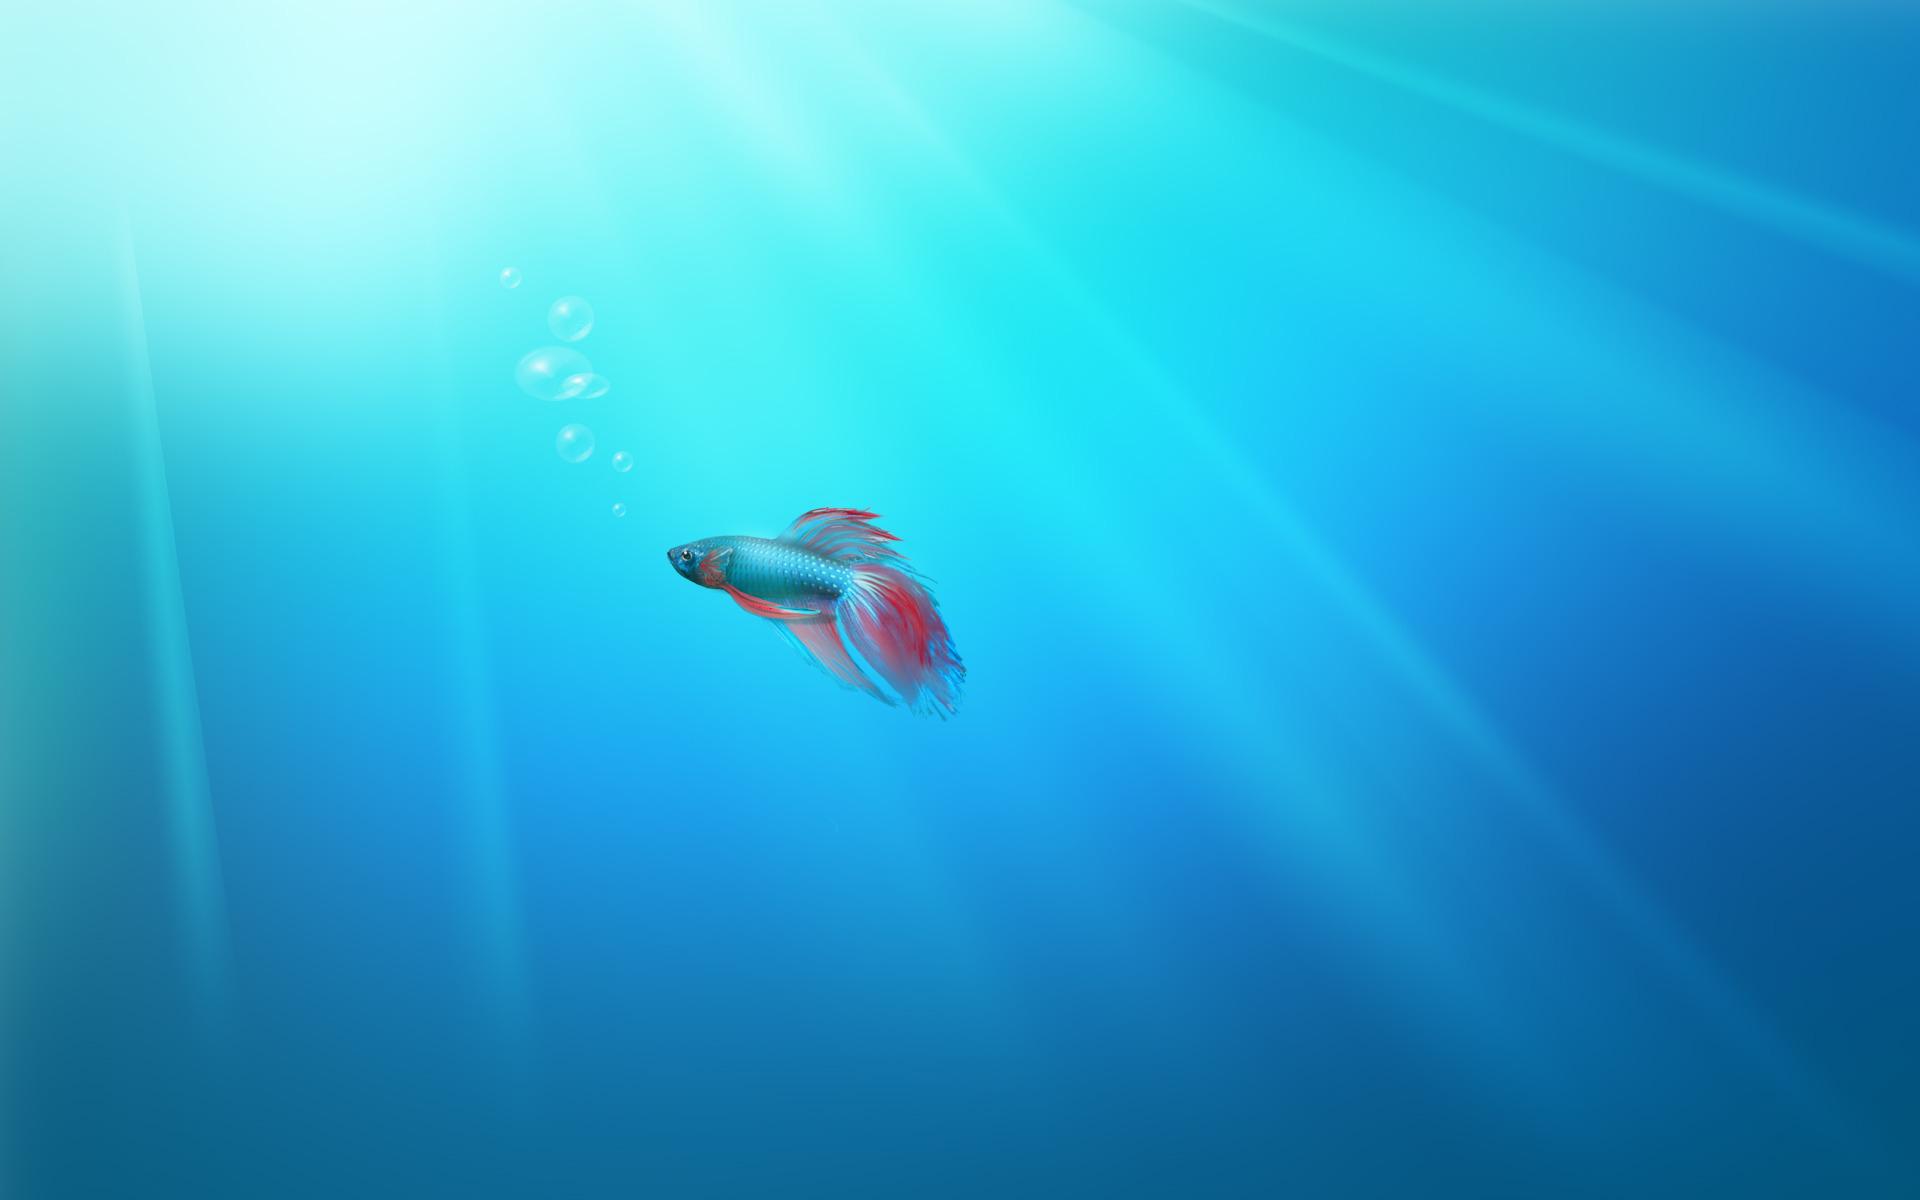 Windows 7 Beta Fish wallpaper 18469 1920x1200